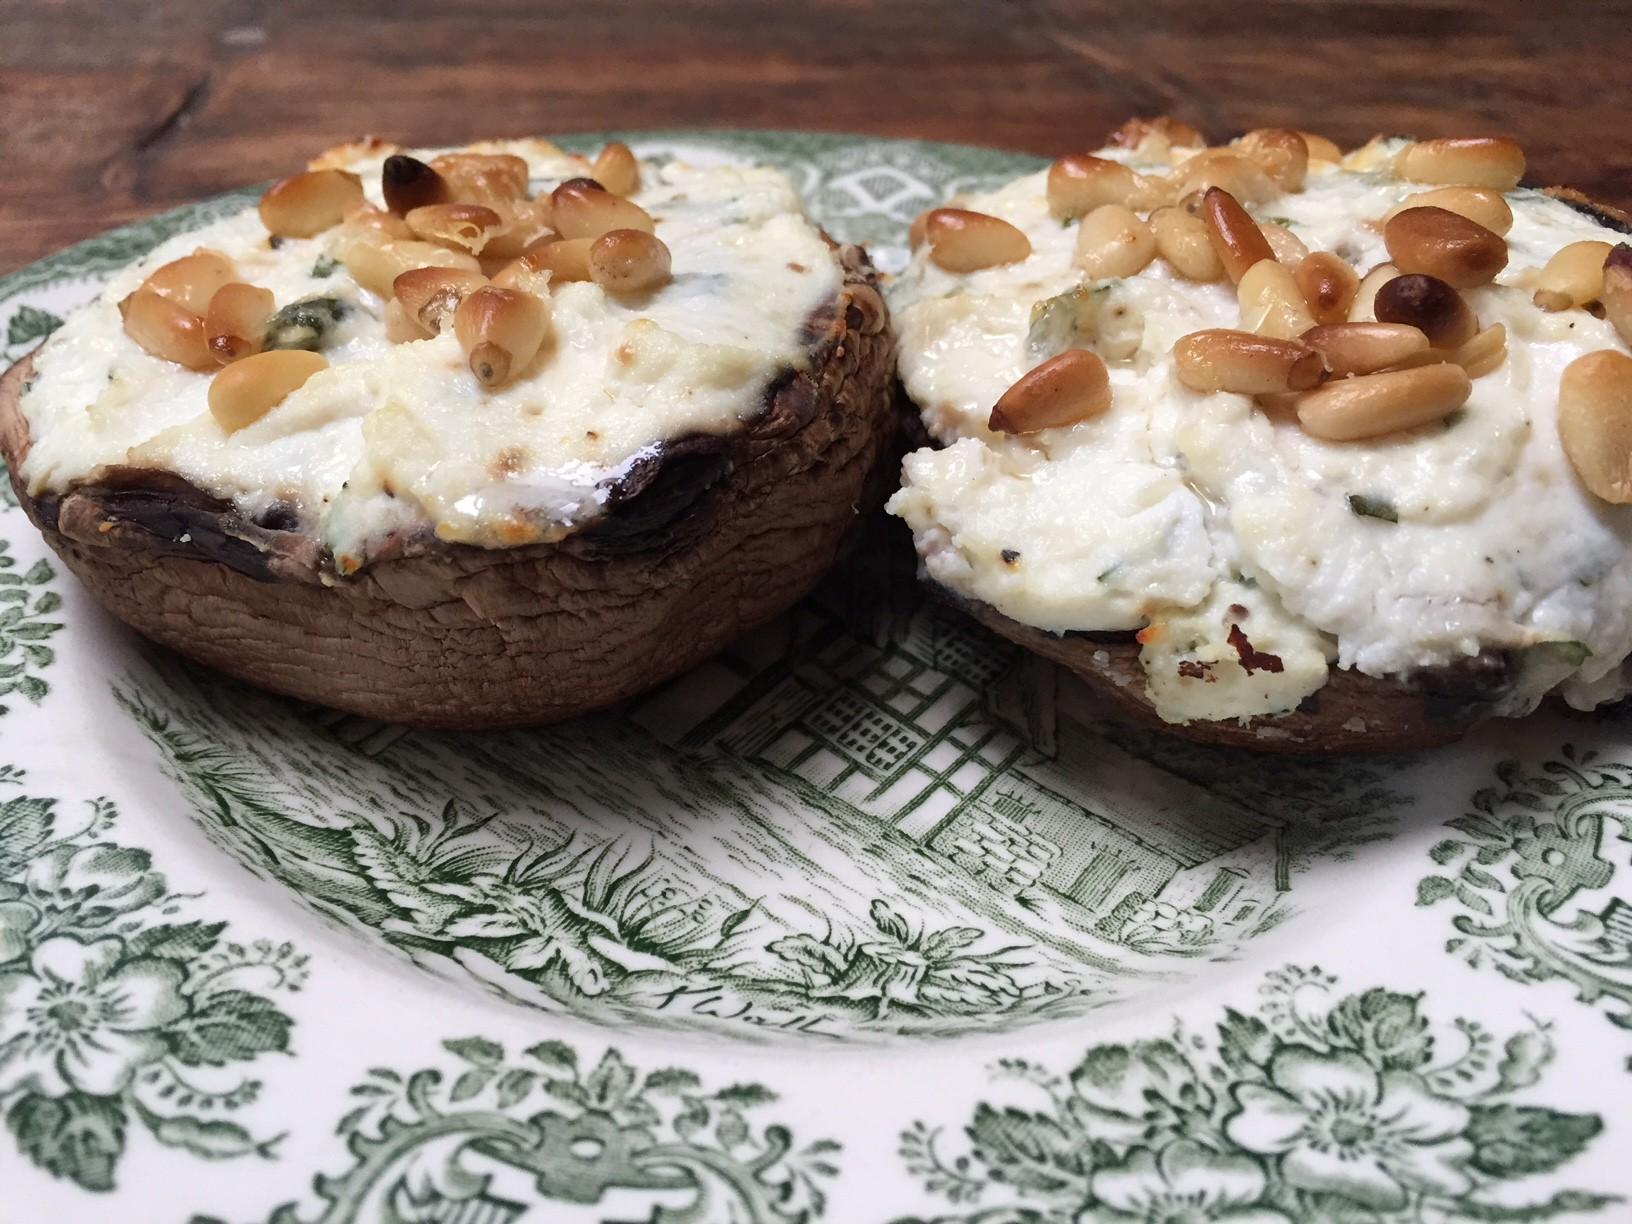 Gevulde portobello met ricotta en munt recept van foodblog Foodinista